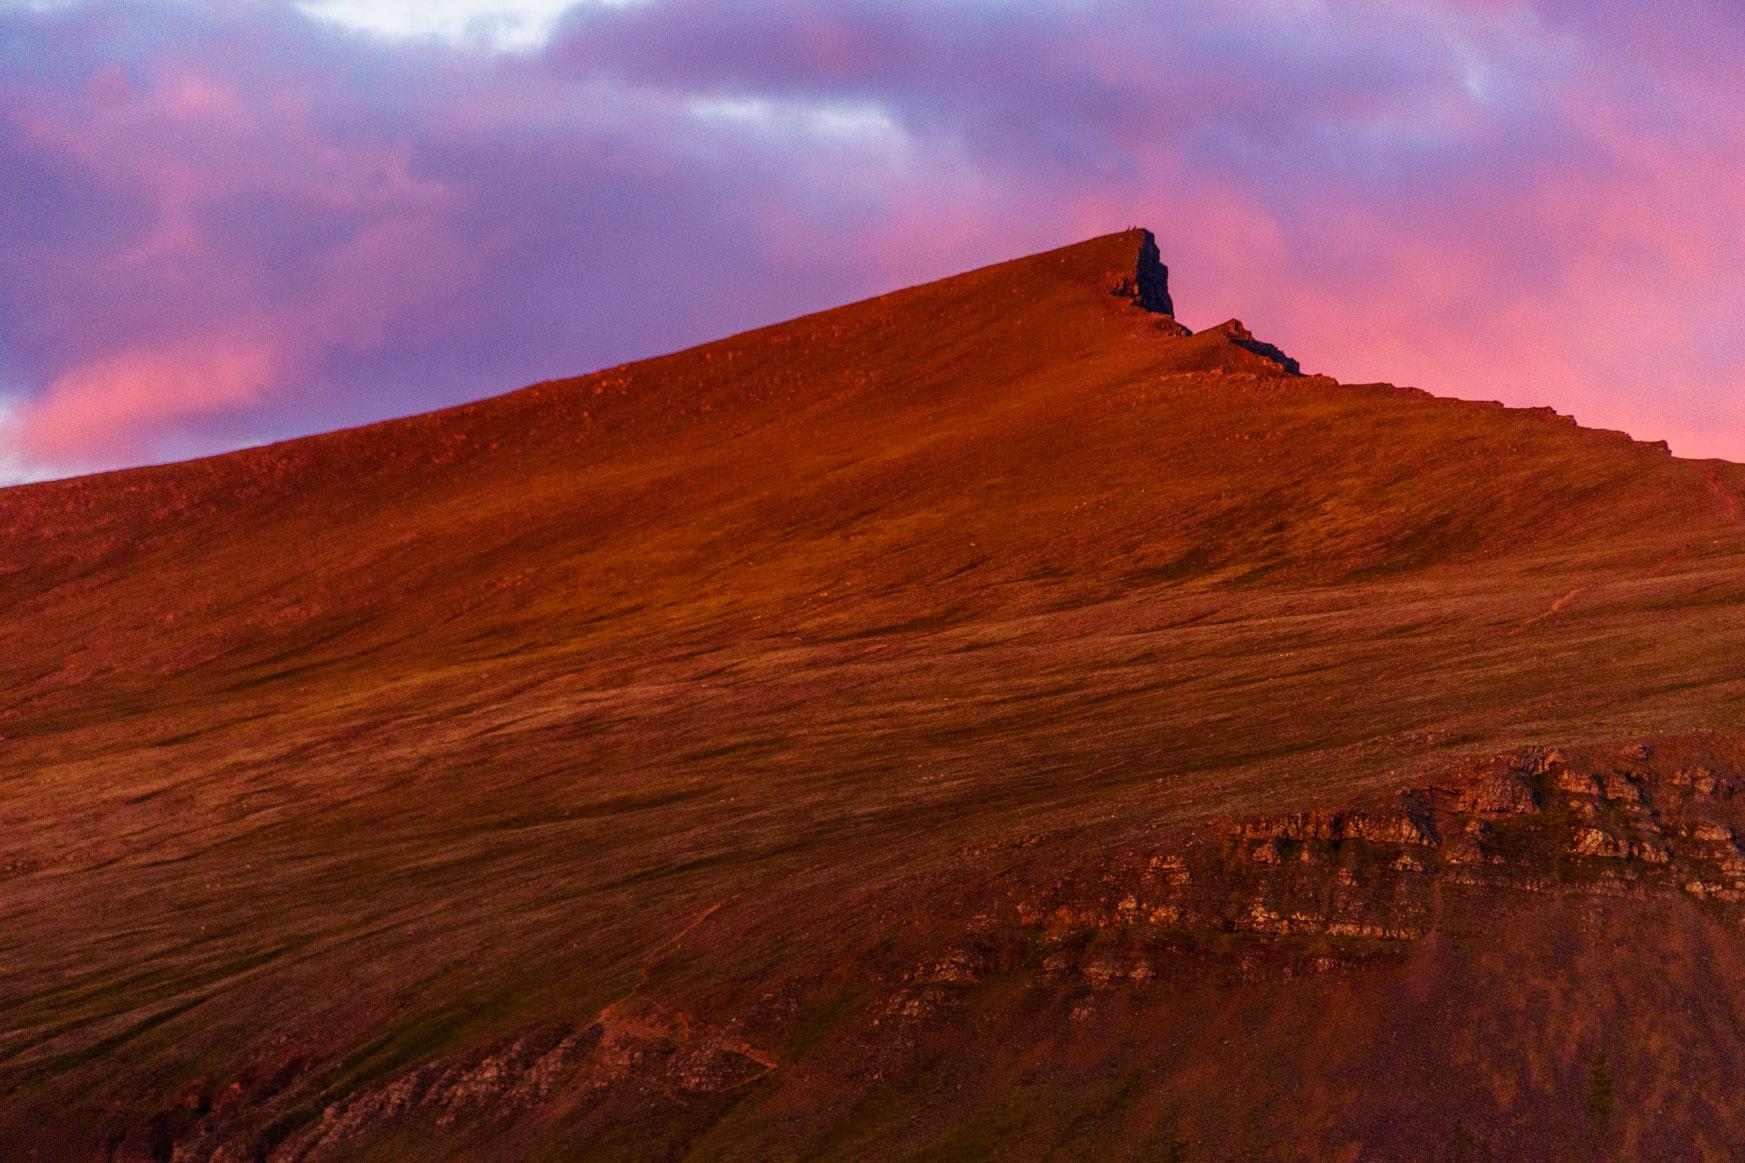 Sonnenuntergang am Akrafjell, dem Hausberg von Akranes